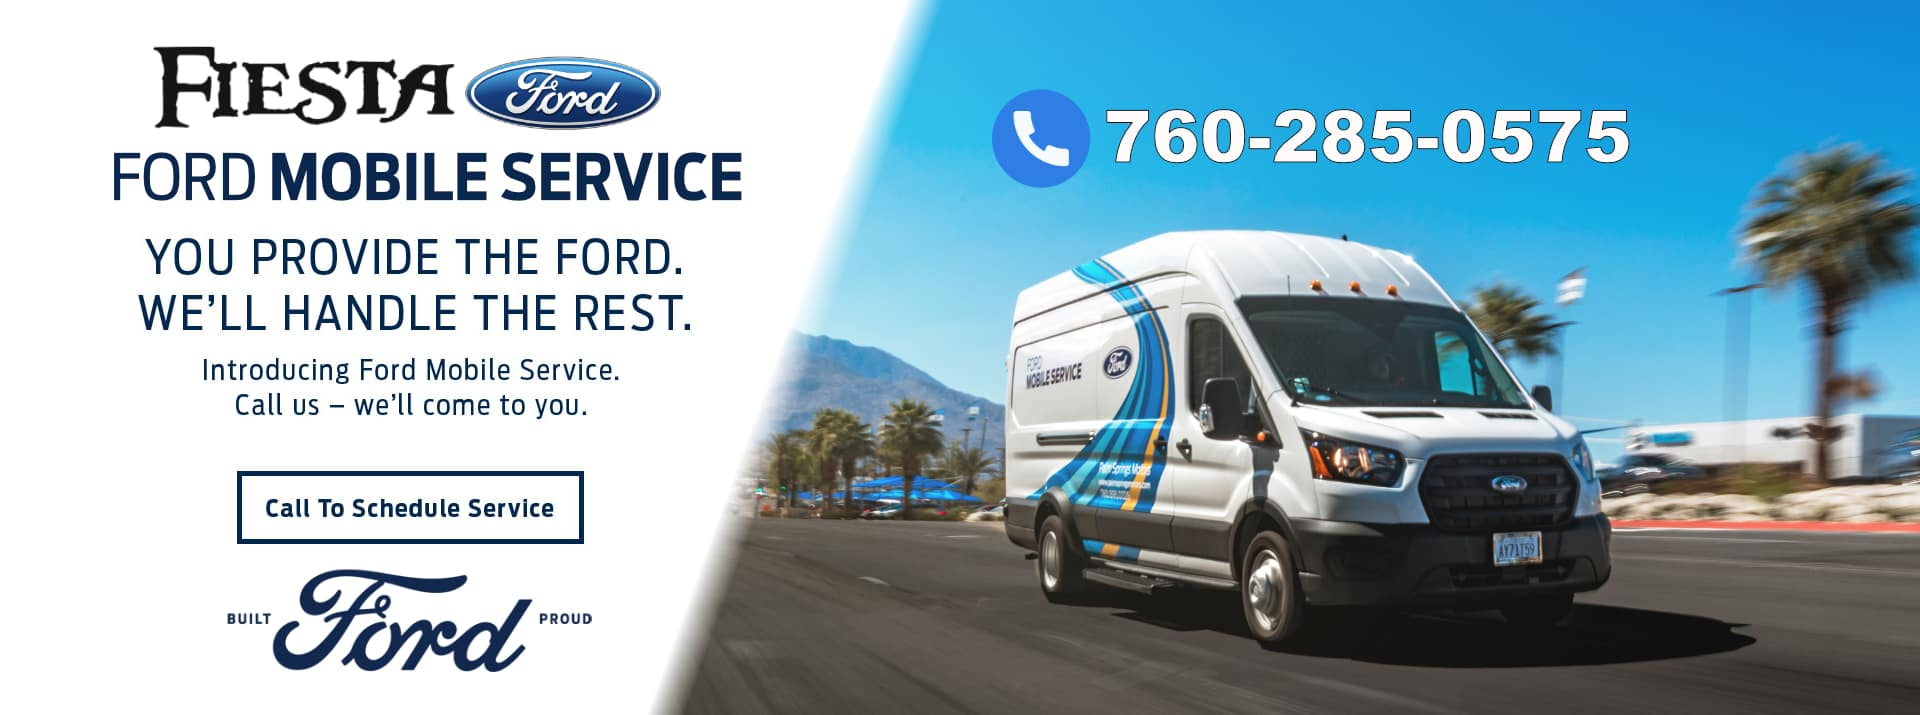 December-2020 Ford Mobile Service FF